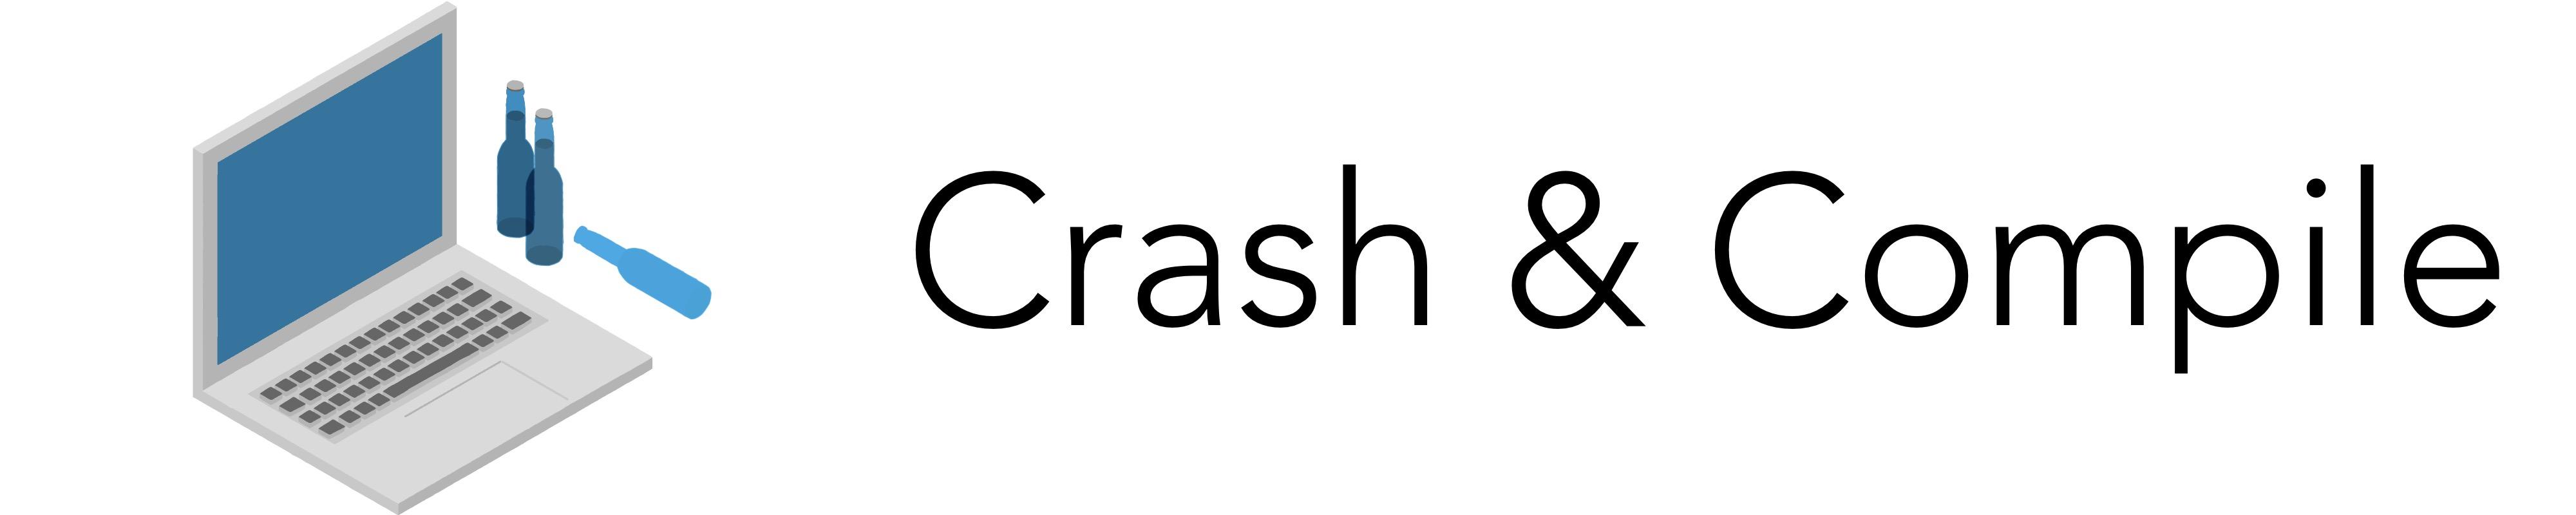 Crash & Compile